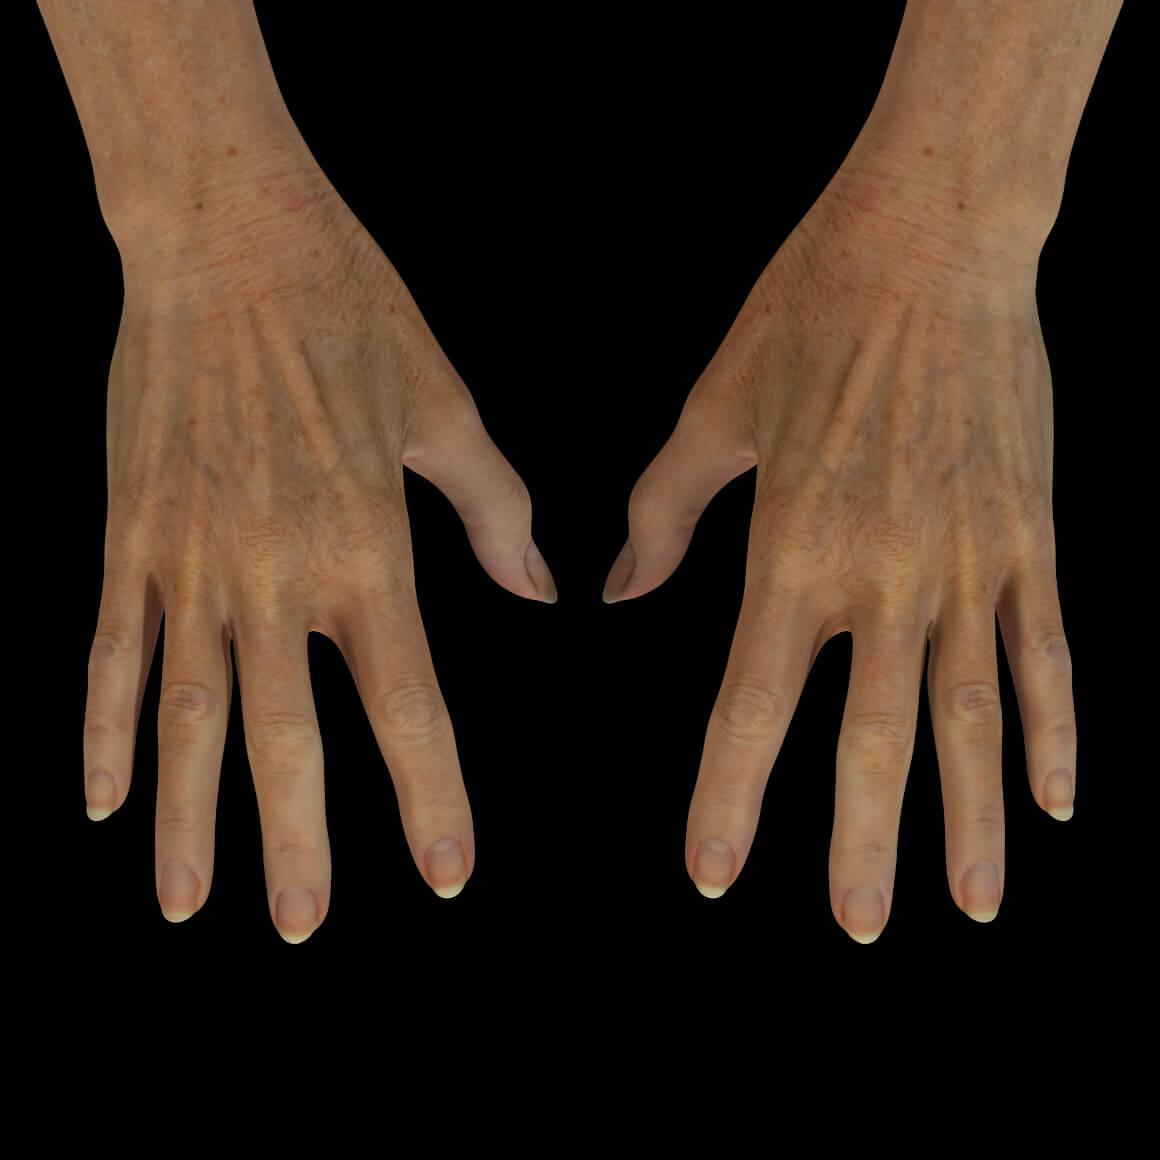 Hands of a Clinique Chloé female patient after platelet-rich plasma treatment, or PRP, to rejuvenate their appearance